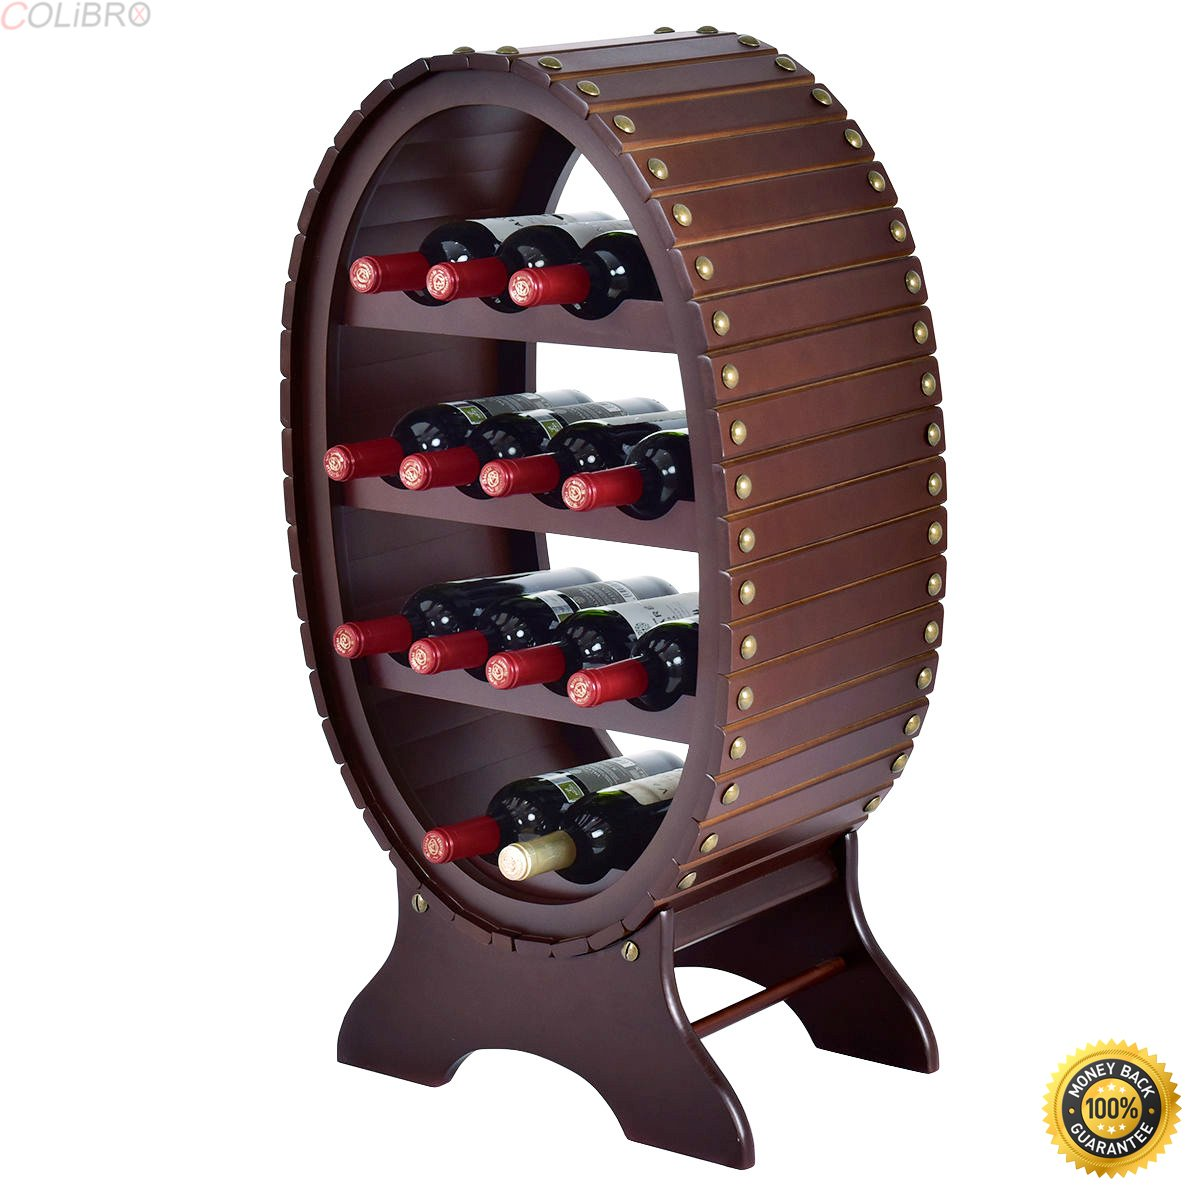 COLIBROX--13 Bottles 4 Tier Vintage Wine Rack Wood Storage Shelf Holder Liquor Home Decor,cheap wine rack,new and Artistic wine rack,Wine Rack Wood Storage